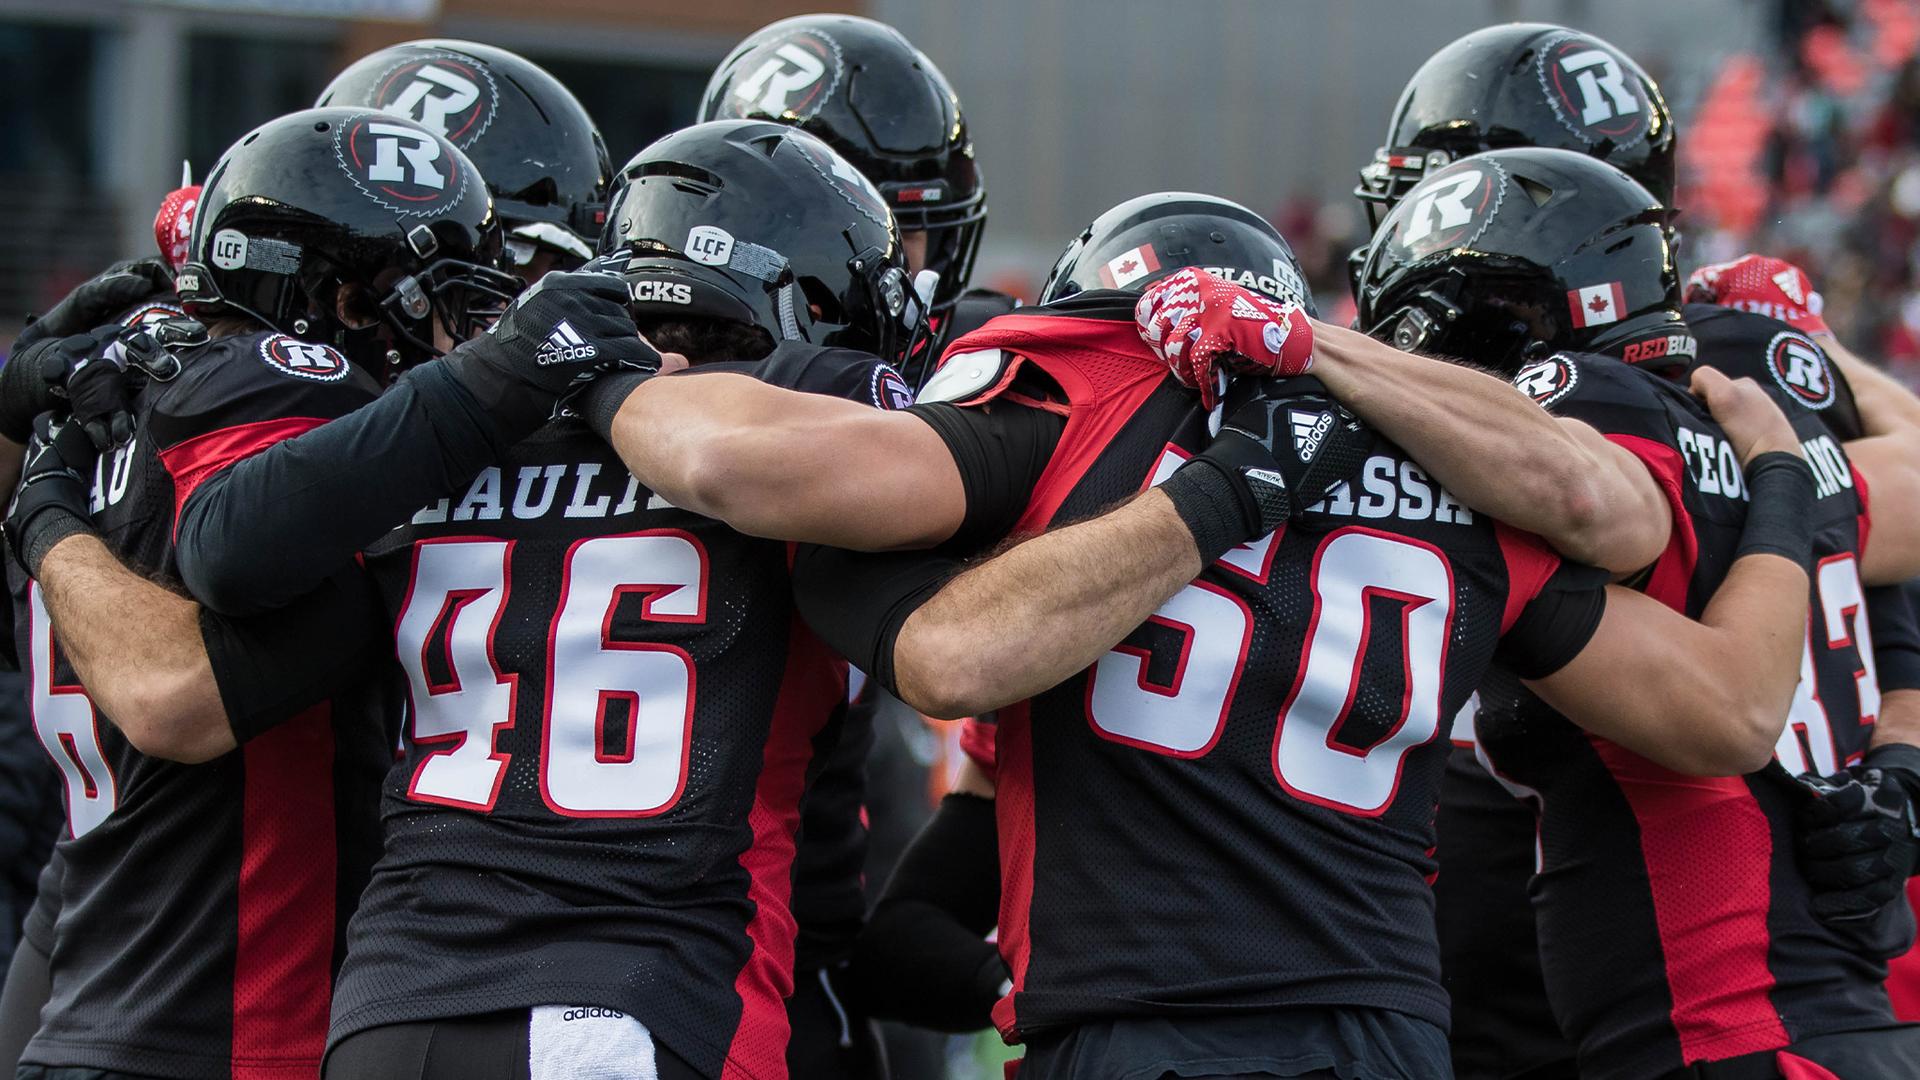 2021 Team Preview: Ottawa REDBLACKS